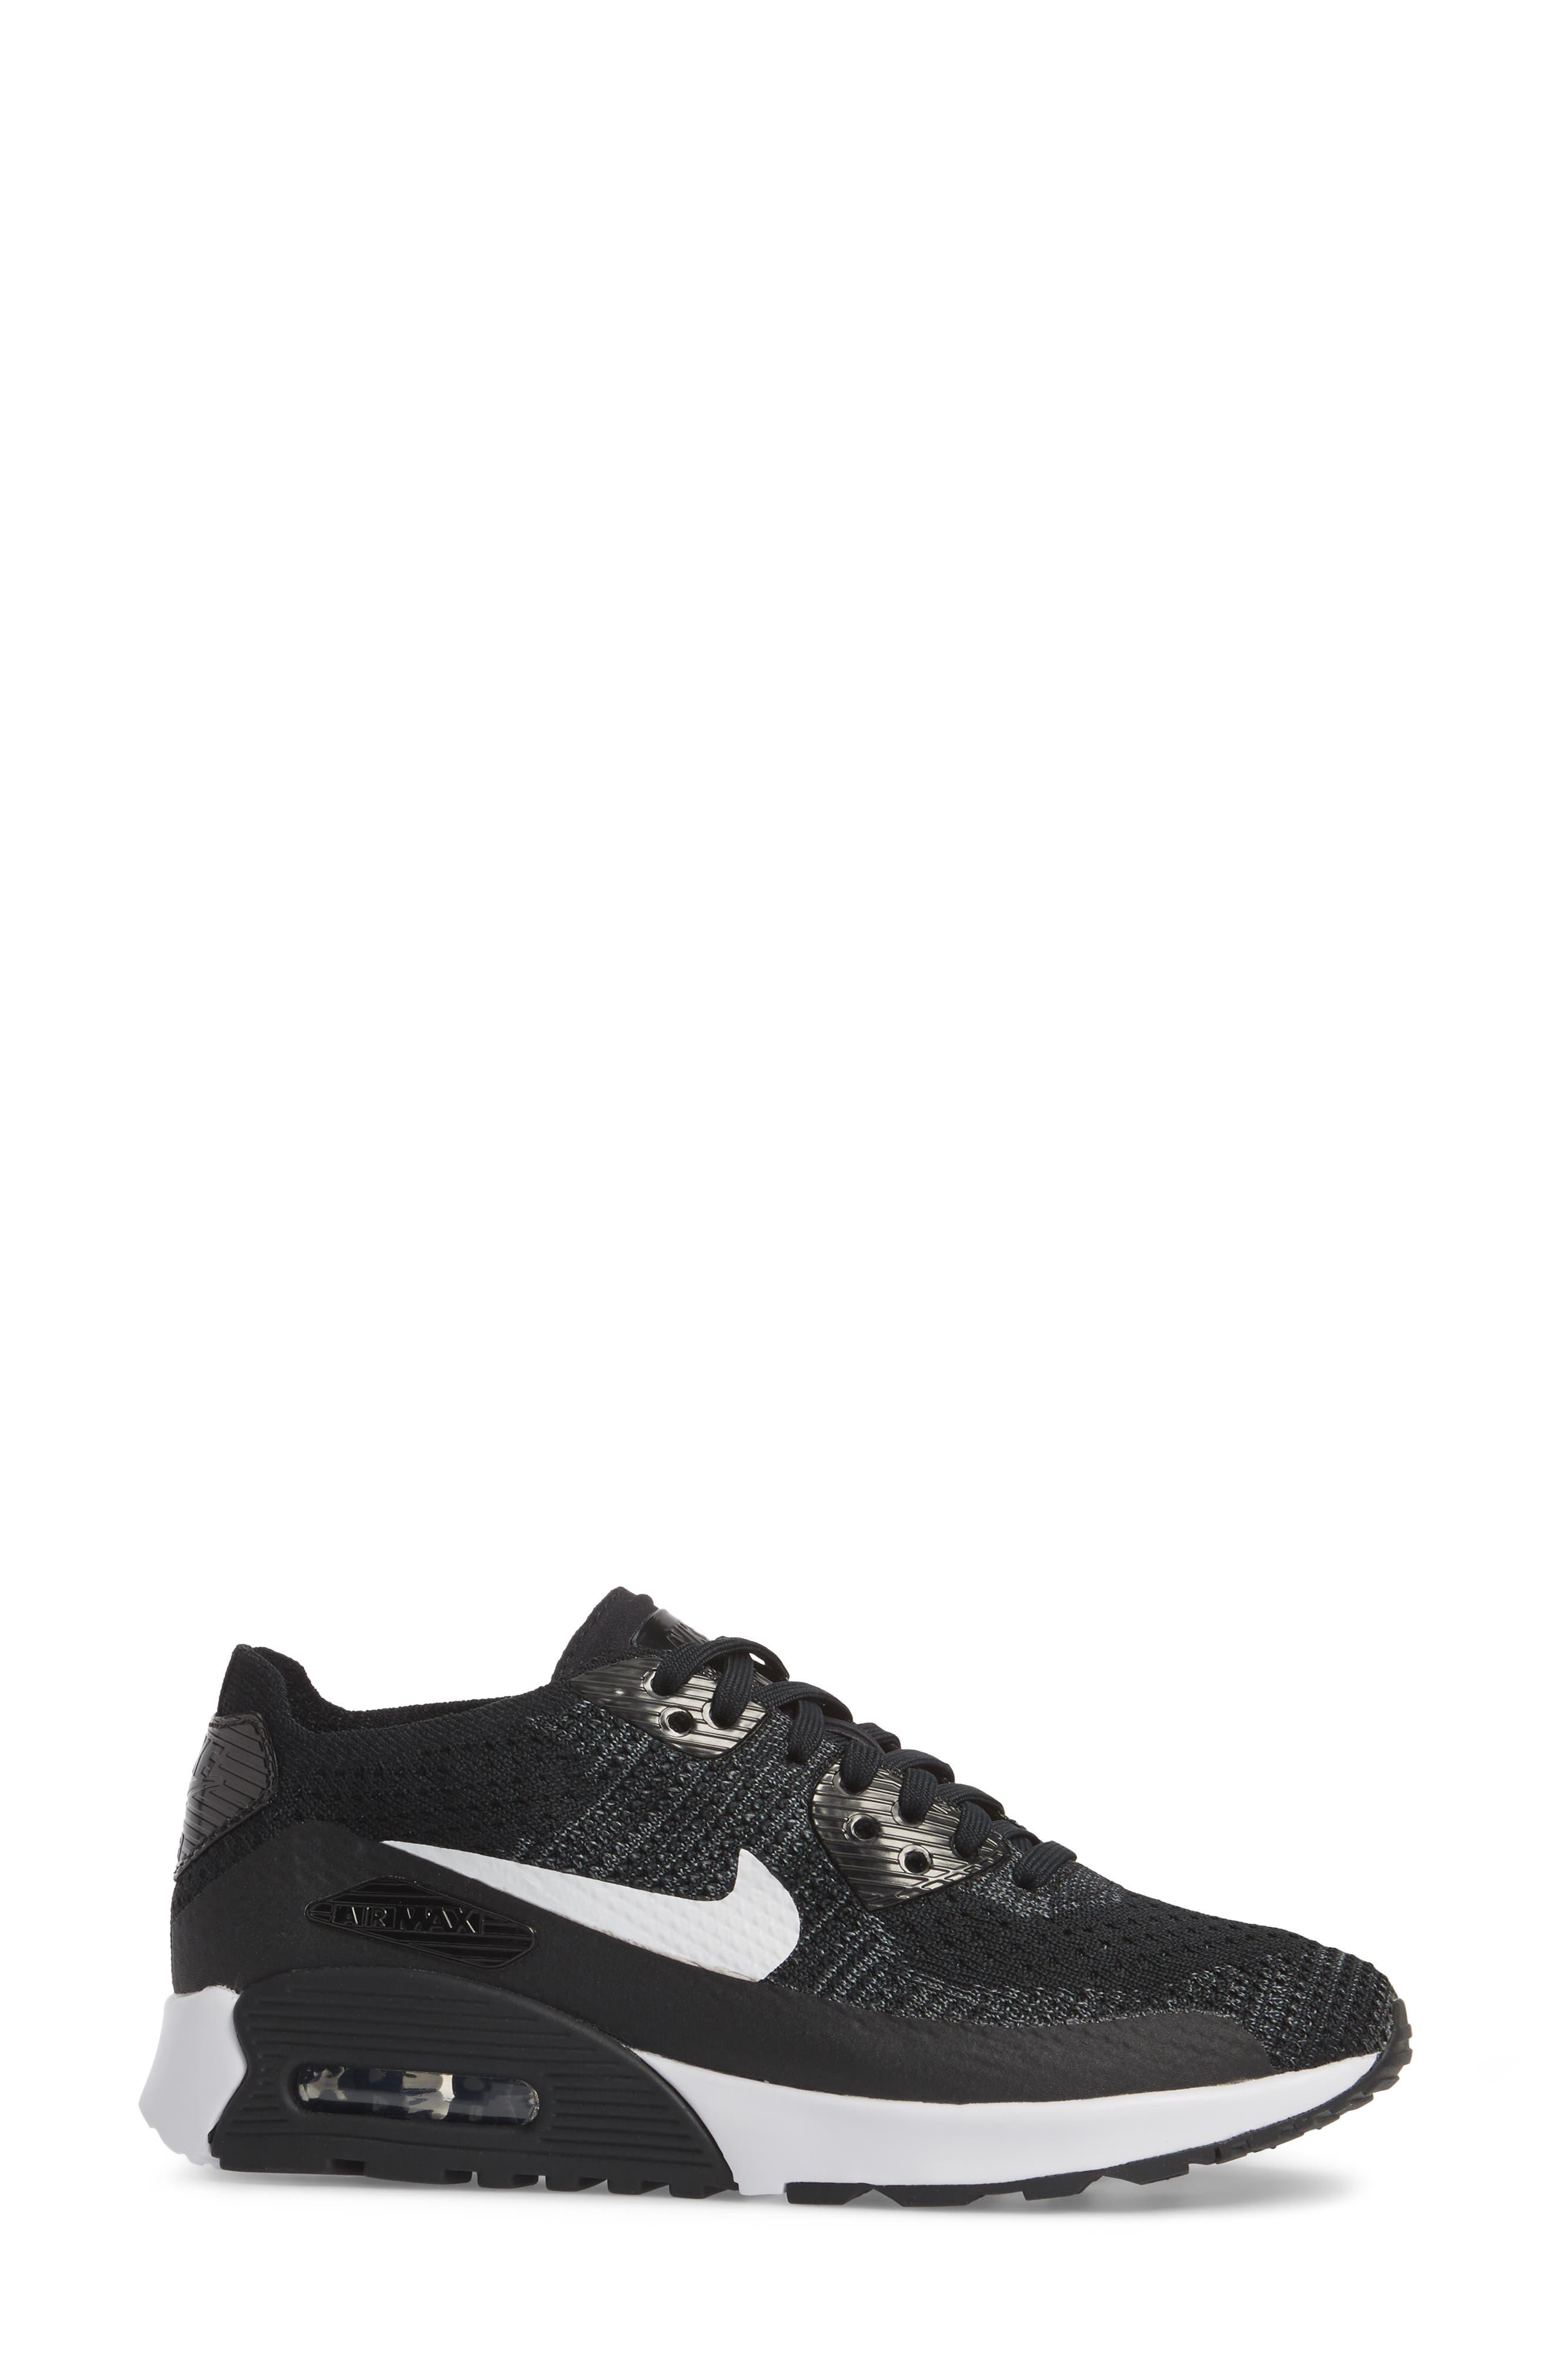 Air Max 90 Flyknit Ultra 2.0 Sneaker,                             Alternate thumbnail 3, color,                             Black/ White/ Dark Grey